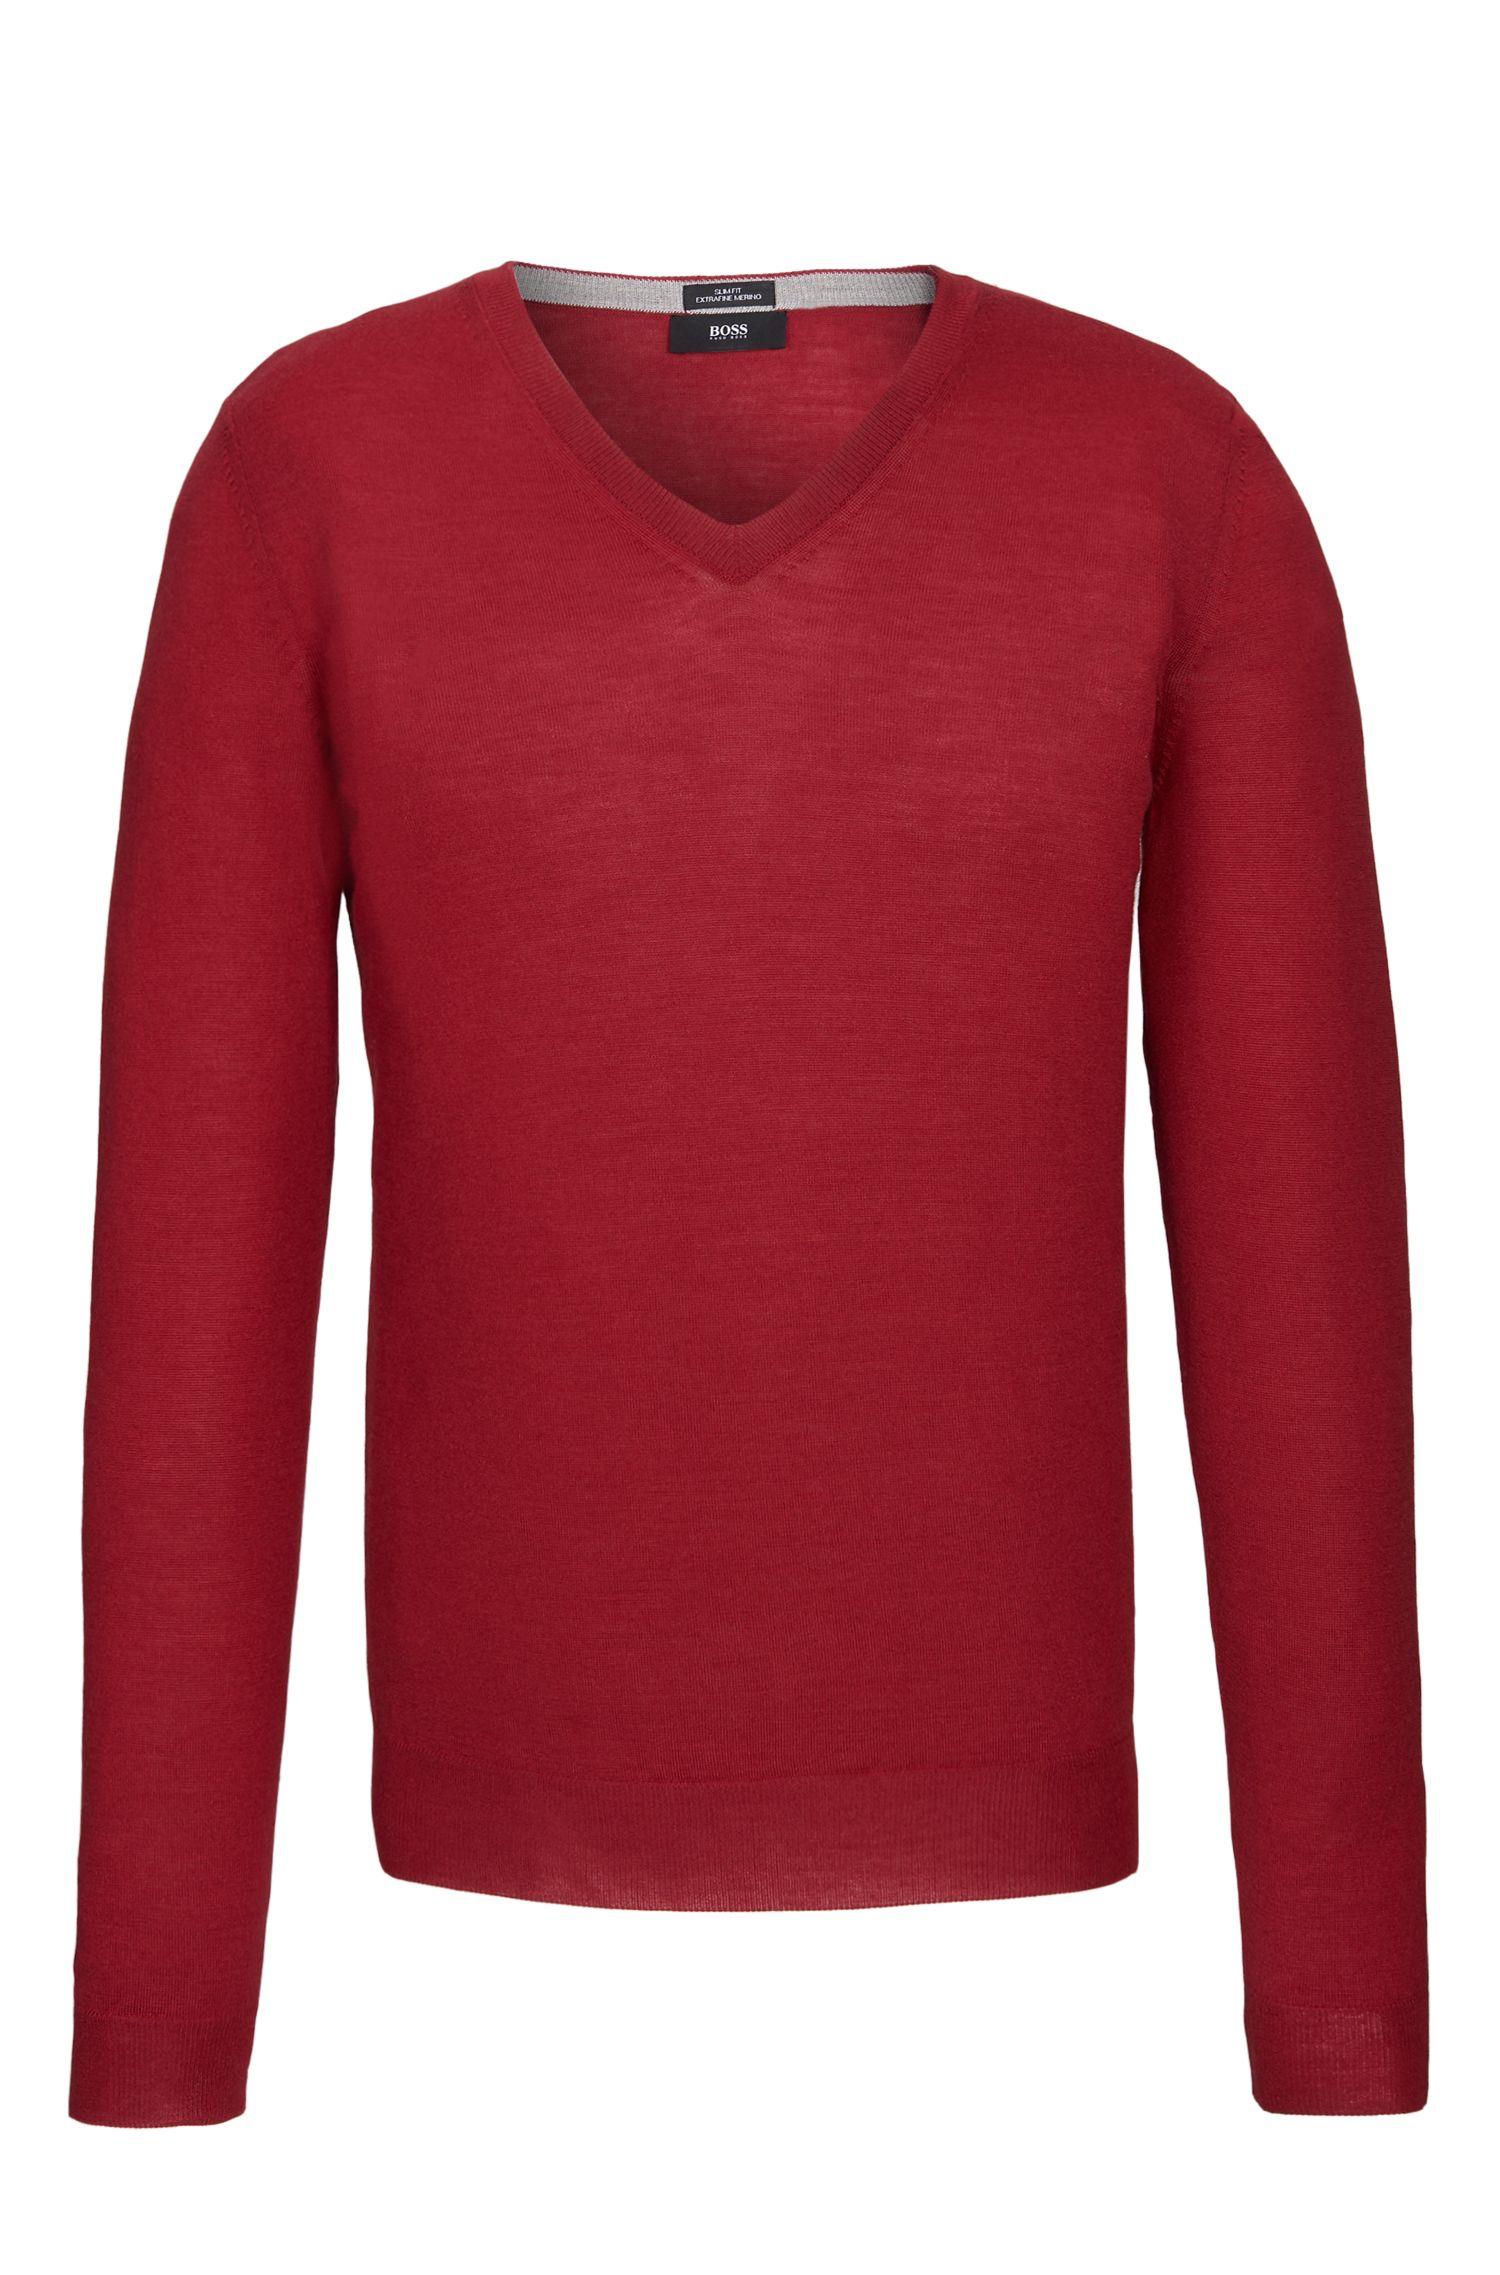 Extra Fine Merino Wool Sweater, Slim Fit | Melba M